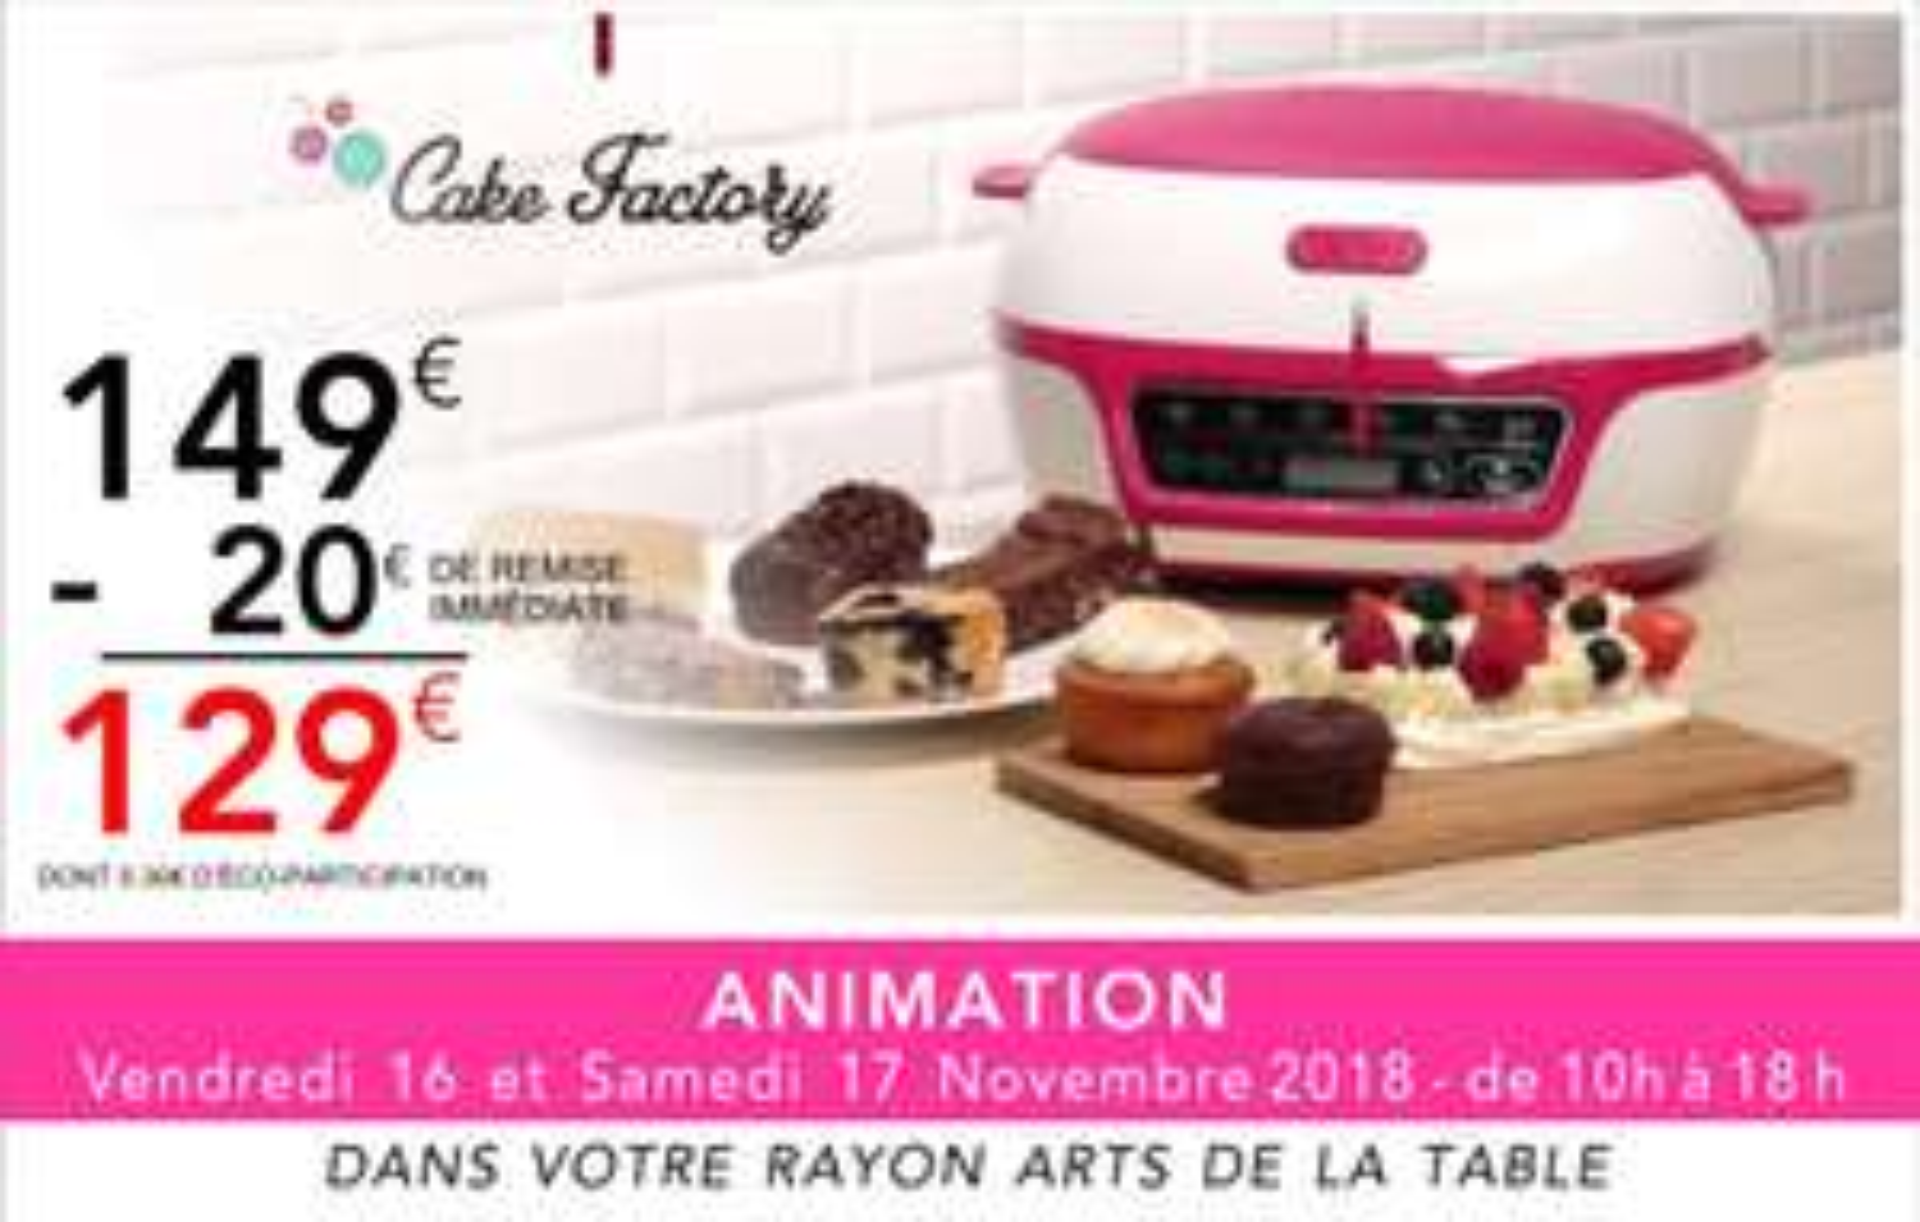 Tefal Cake Factory - Gouesnou (29)